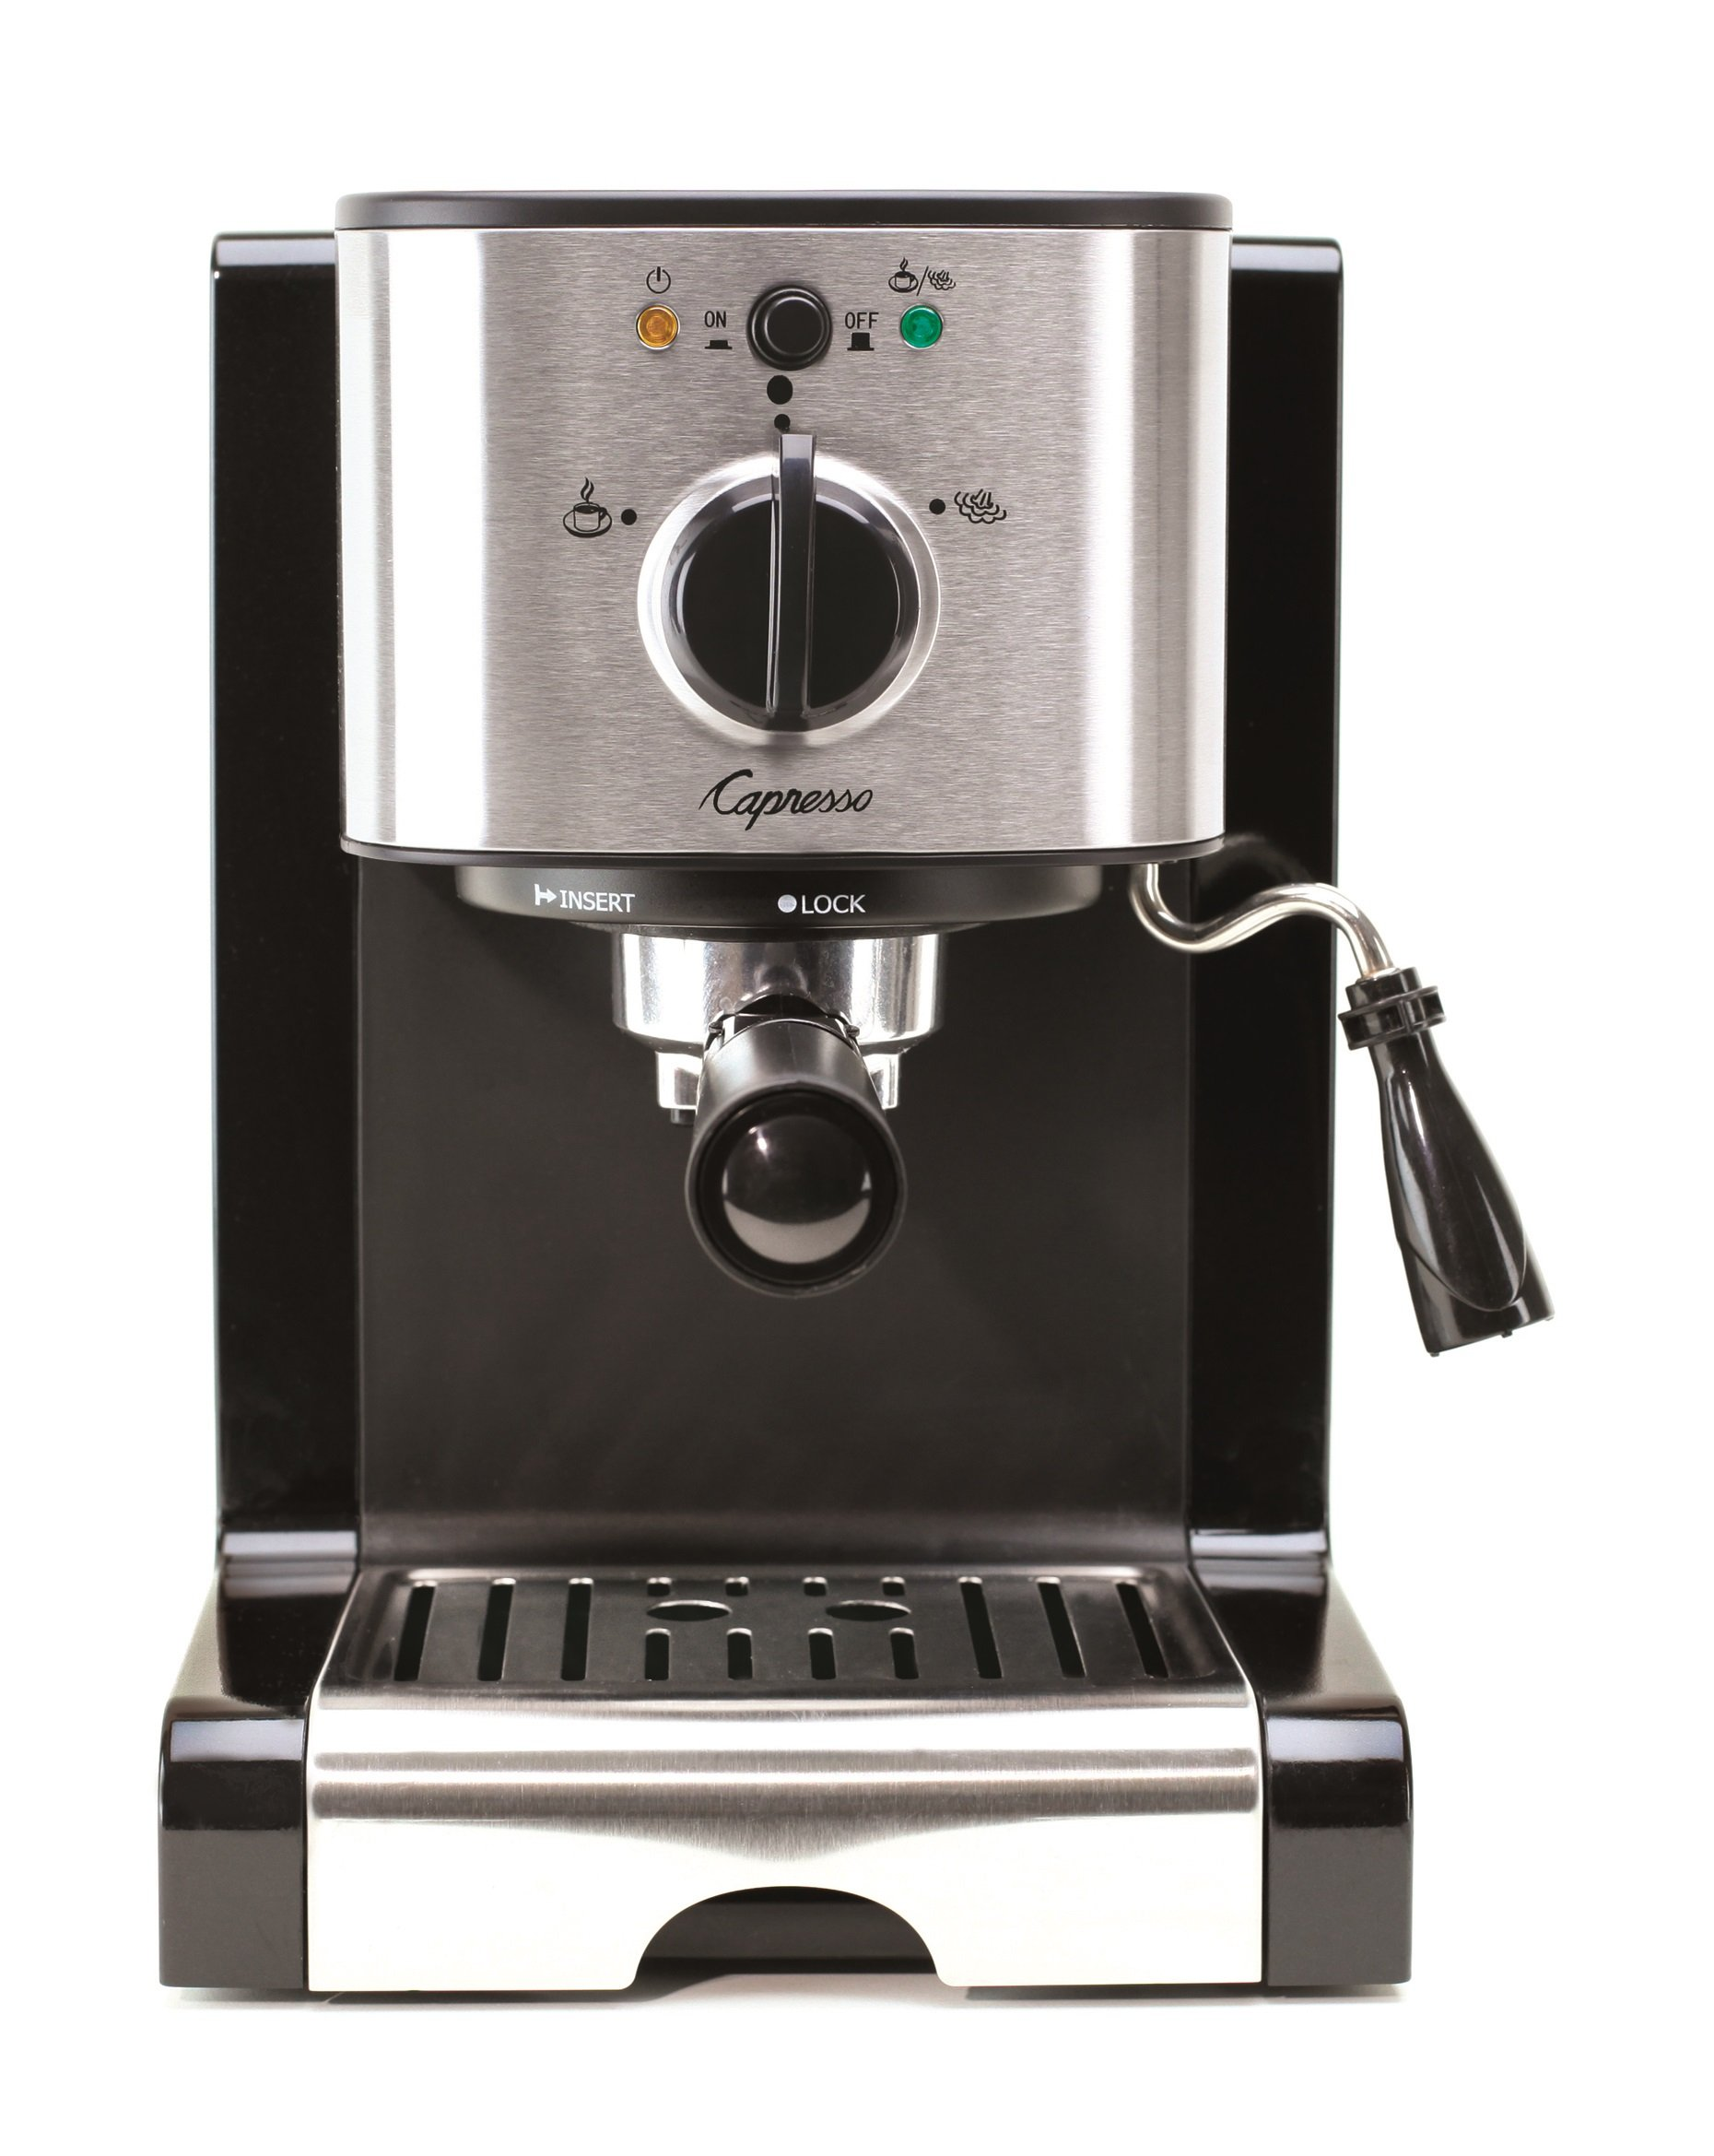 Capresso 116.04 Pump Espresso and Cappuccino Machine EC100, Black and Stainless by Capresso